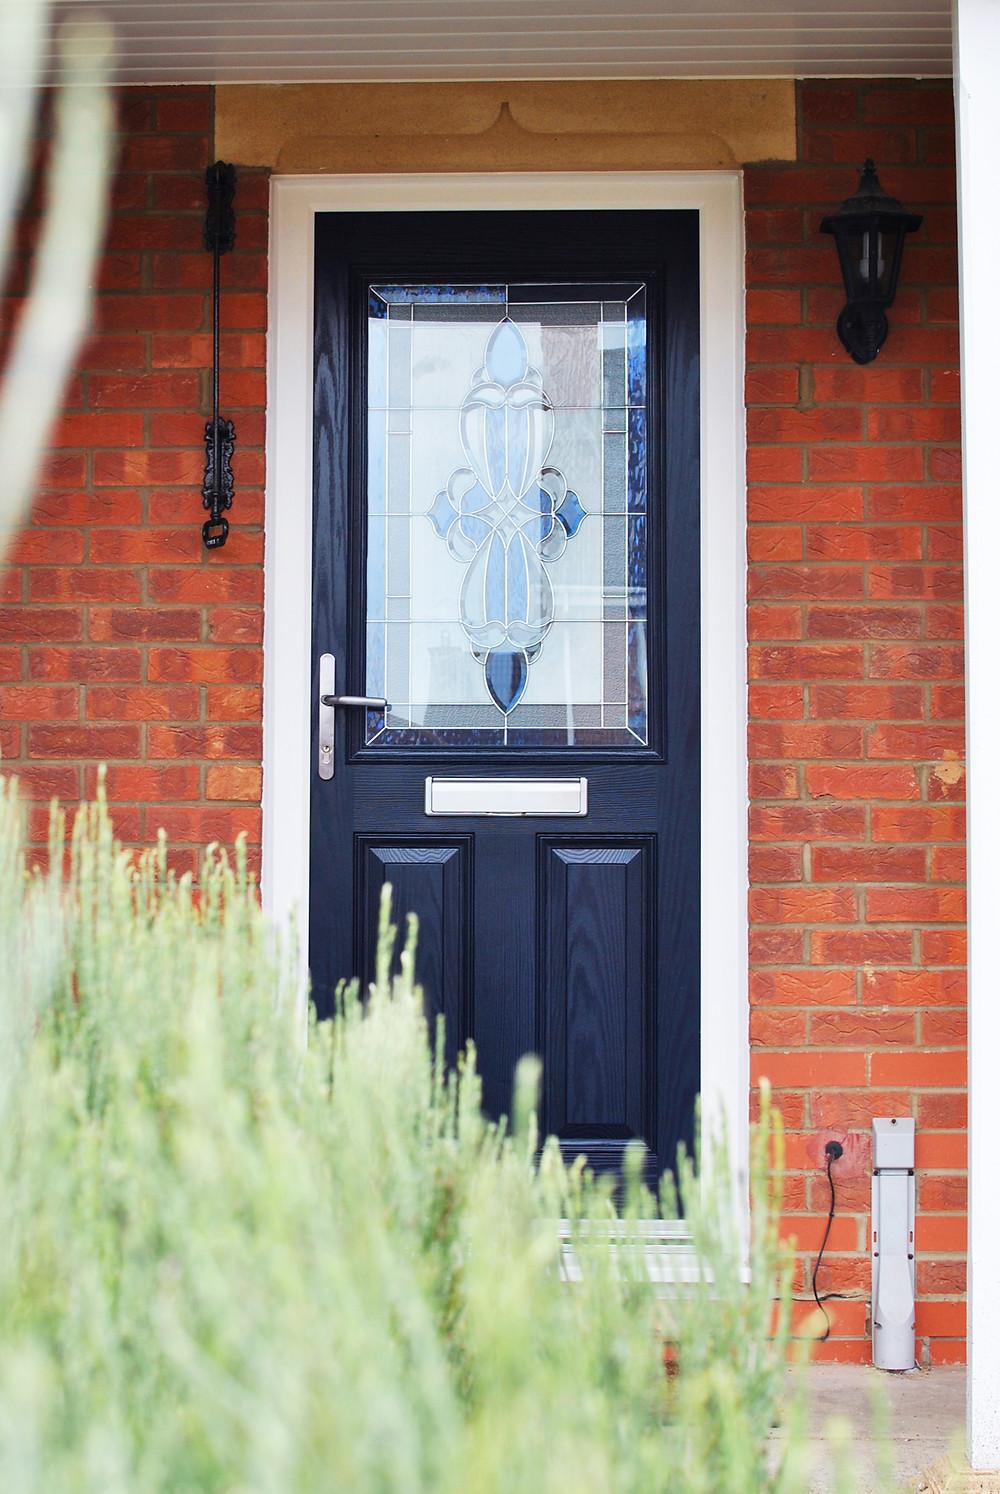 composite door installation in middlesbrough - redcar - teesside - northeast - stockton - darlington - marske -whitby